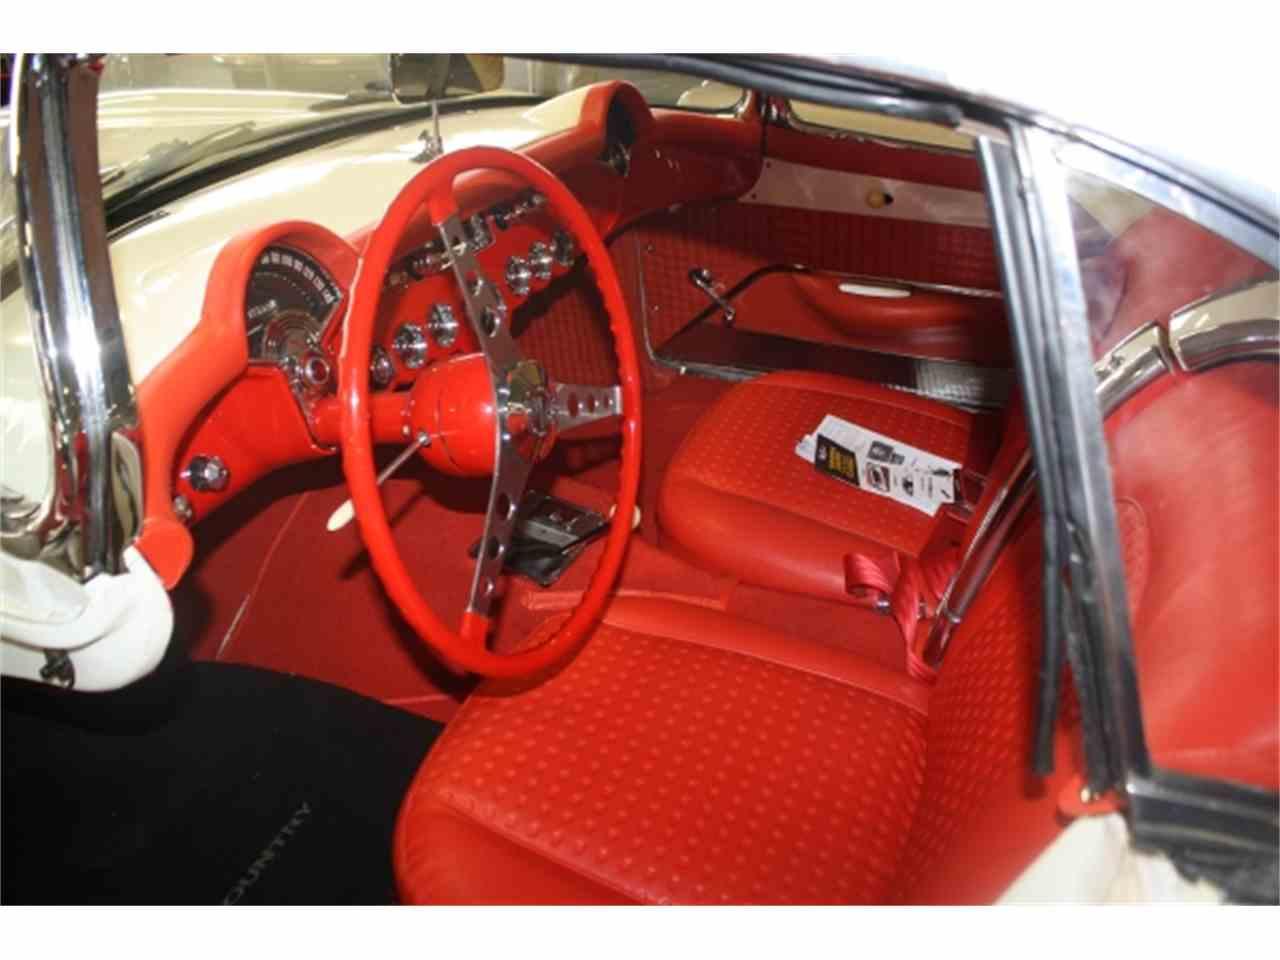 Large Picture of 1956 Corvette located in Branson Missouri - $79,900.00 Offered by Branson Auto & Farm Museum - DSDF